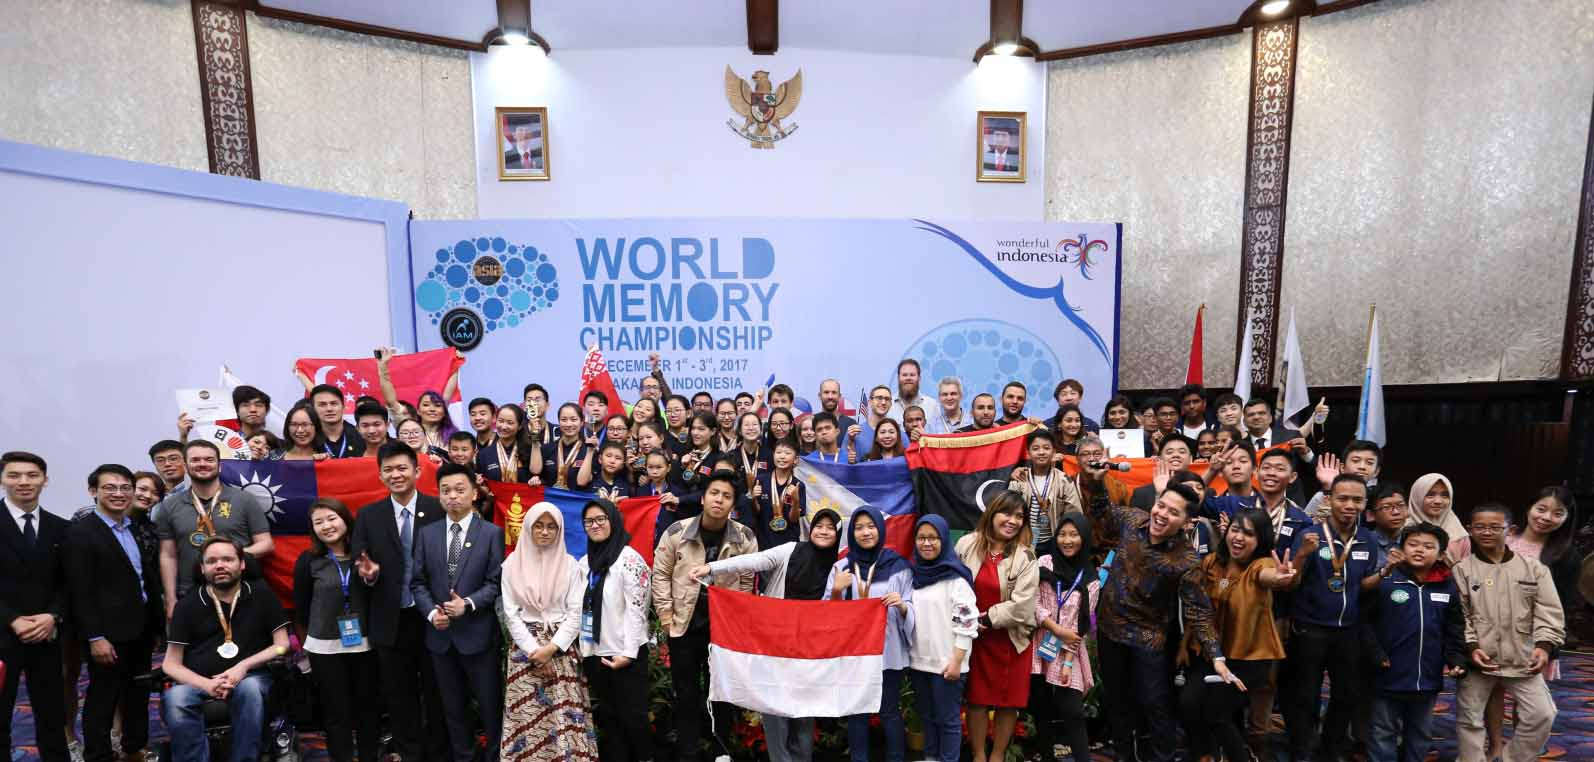 World Memory Championship 2017